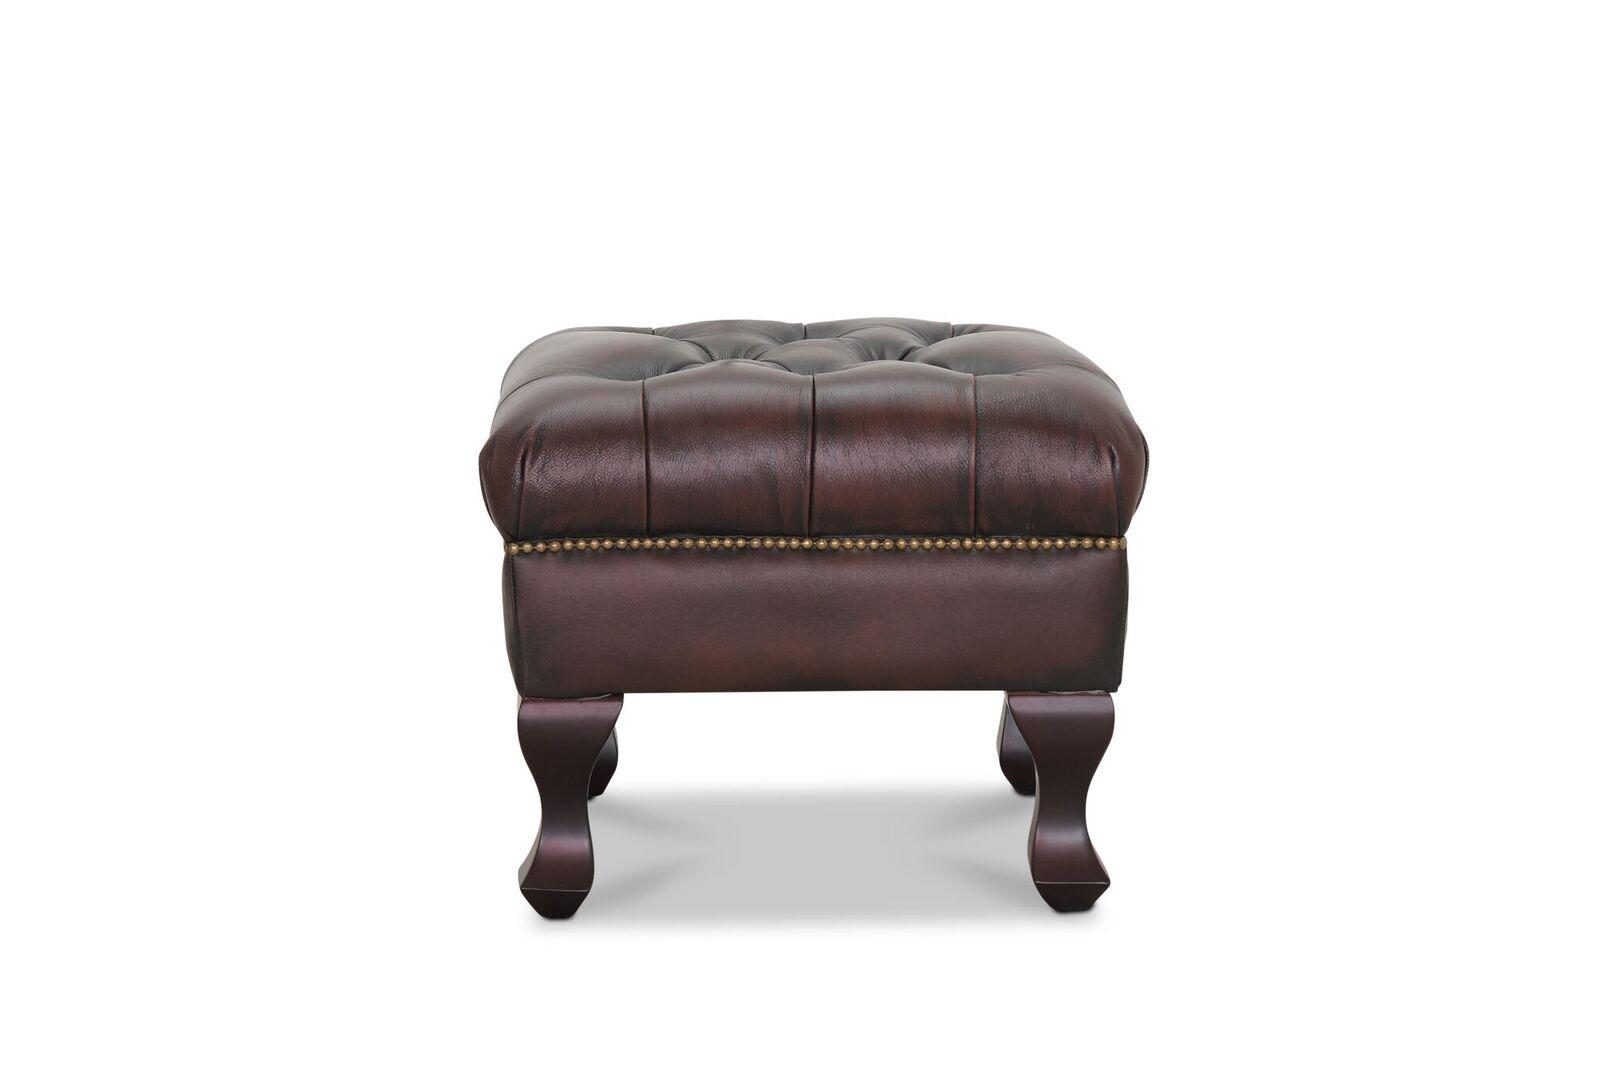 HAGA Aberdeen skammel - brun læder PU